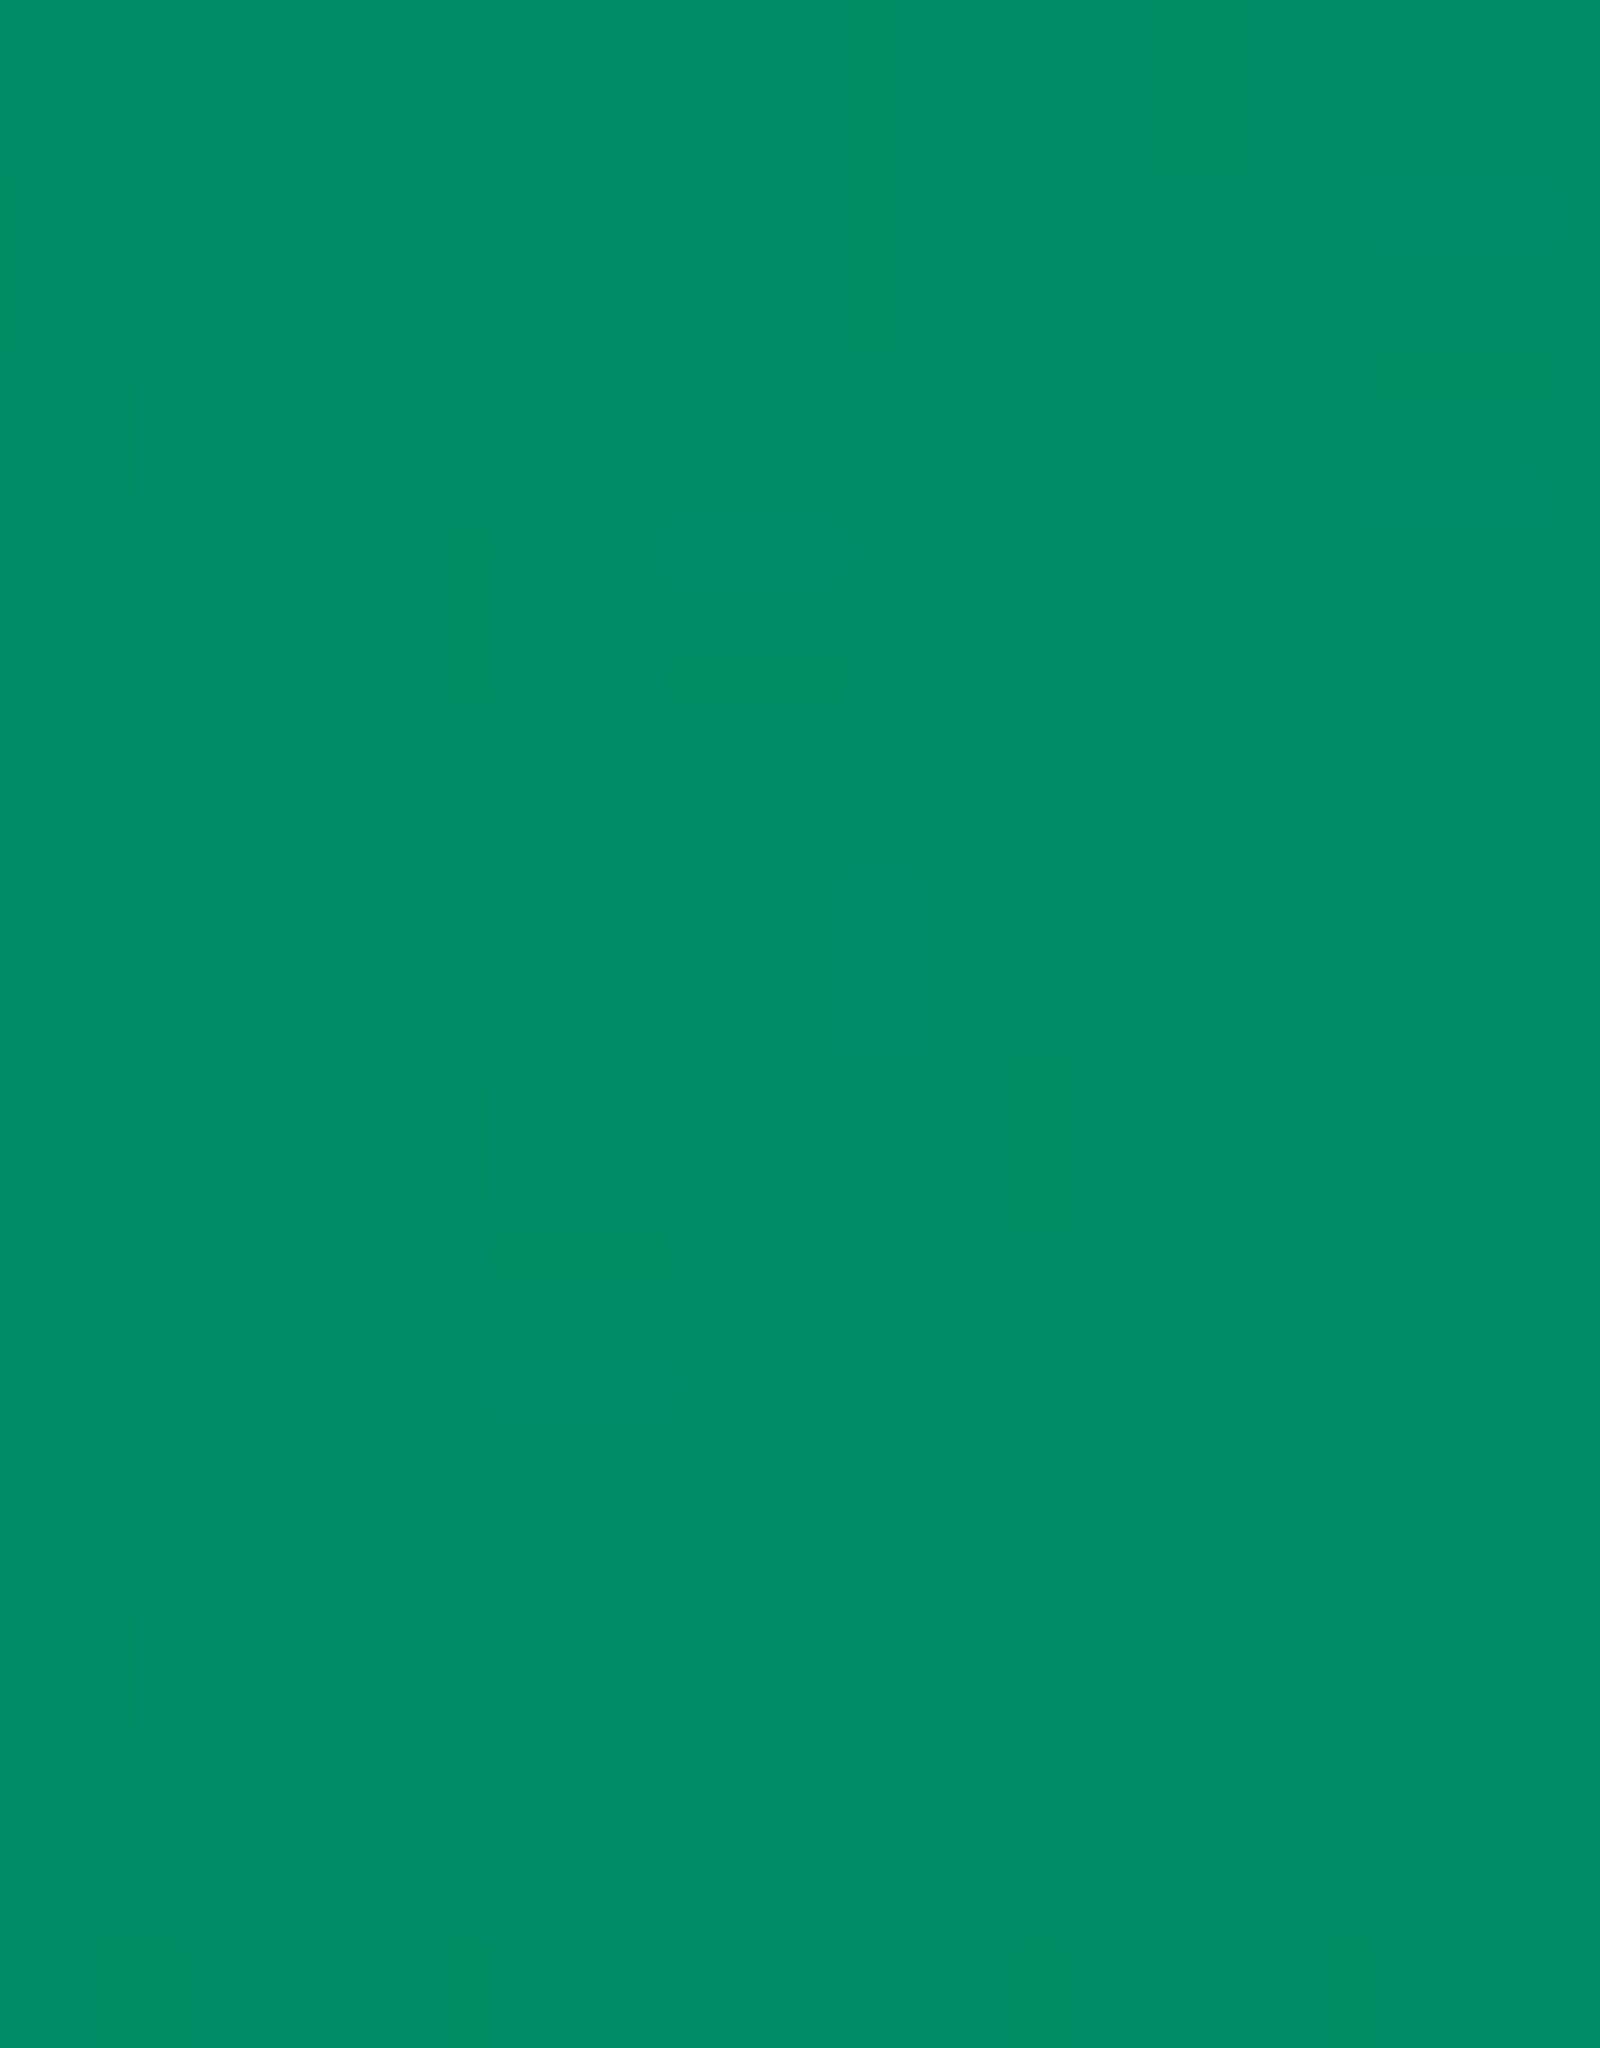 Jacquard Dye-na-Flow Smaragd Grün